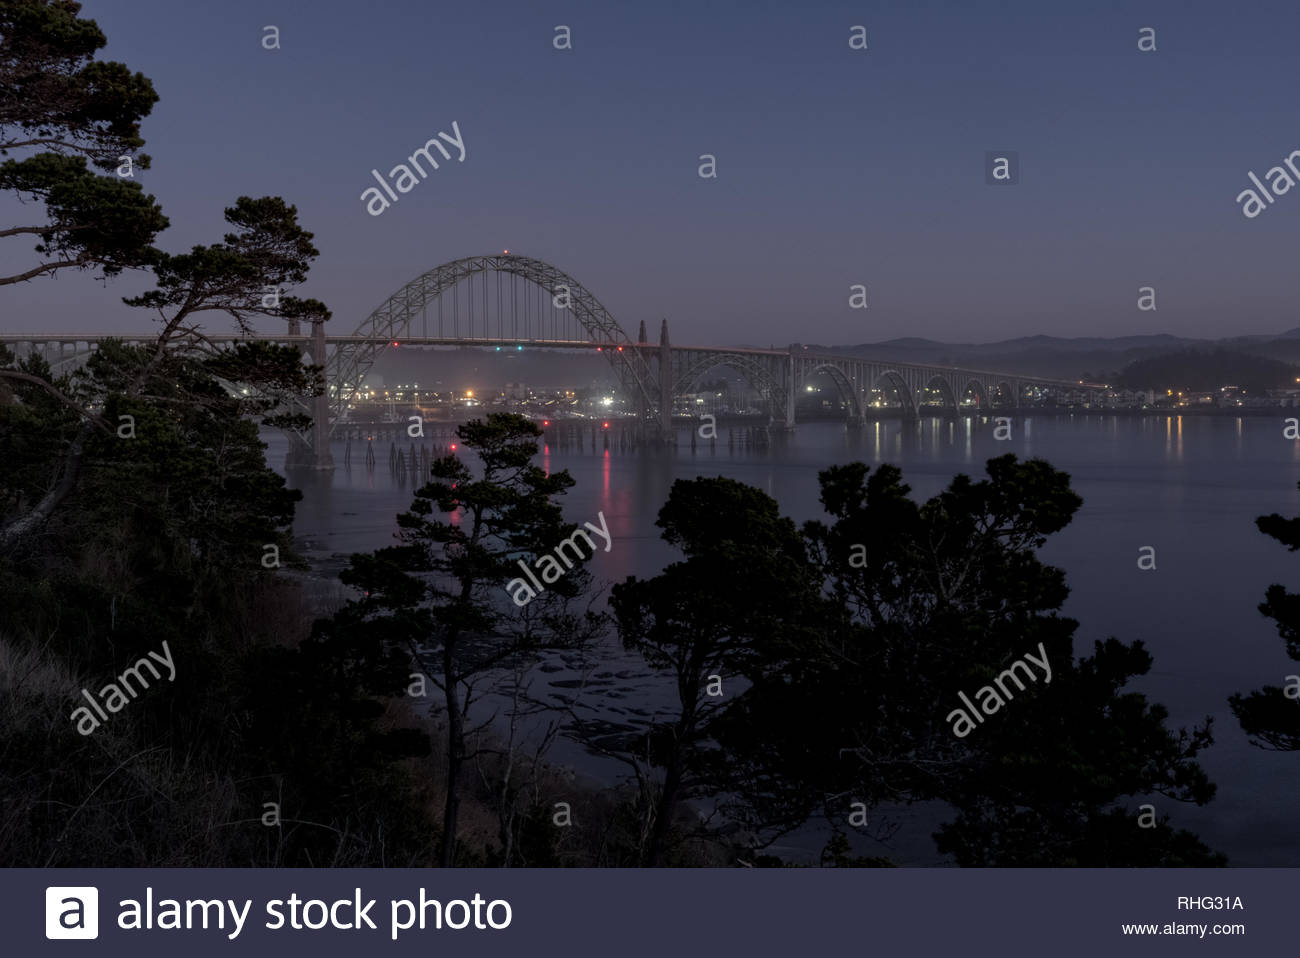 Yaquina Bay Bridge at dusk, Newport, Oregon. Silhouetted trees in foreground frame bridge. - Stock Image